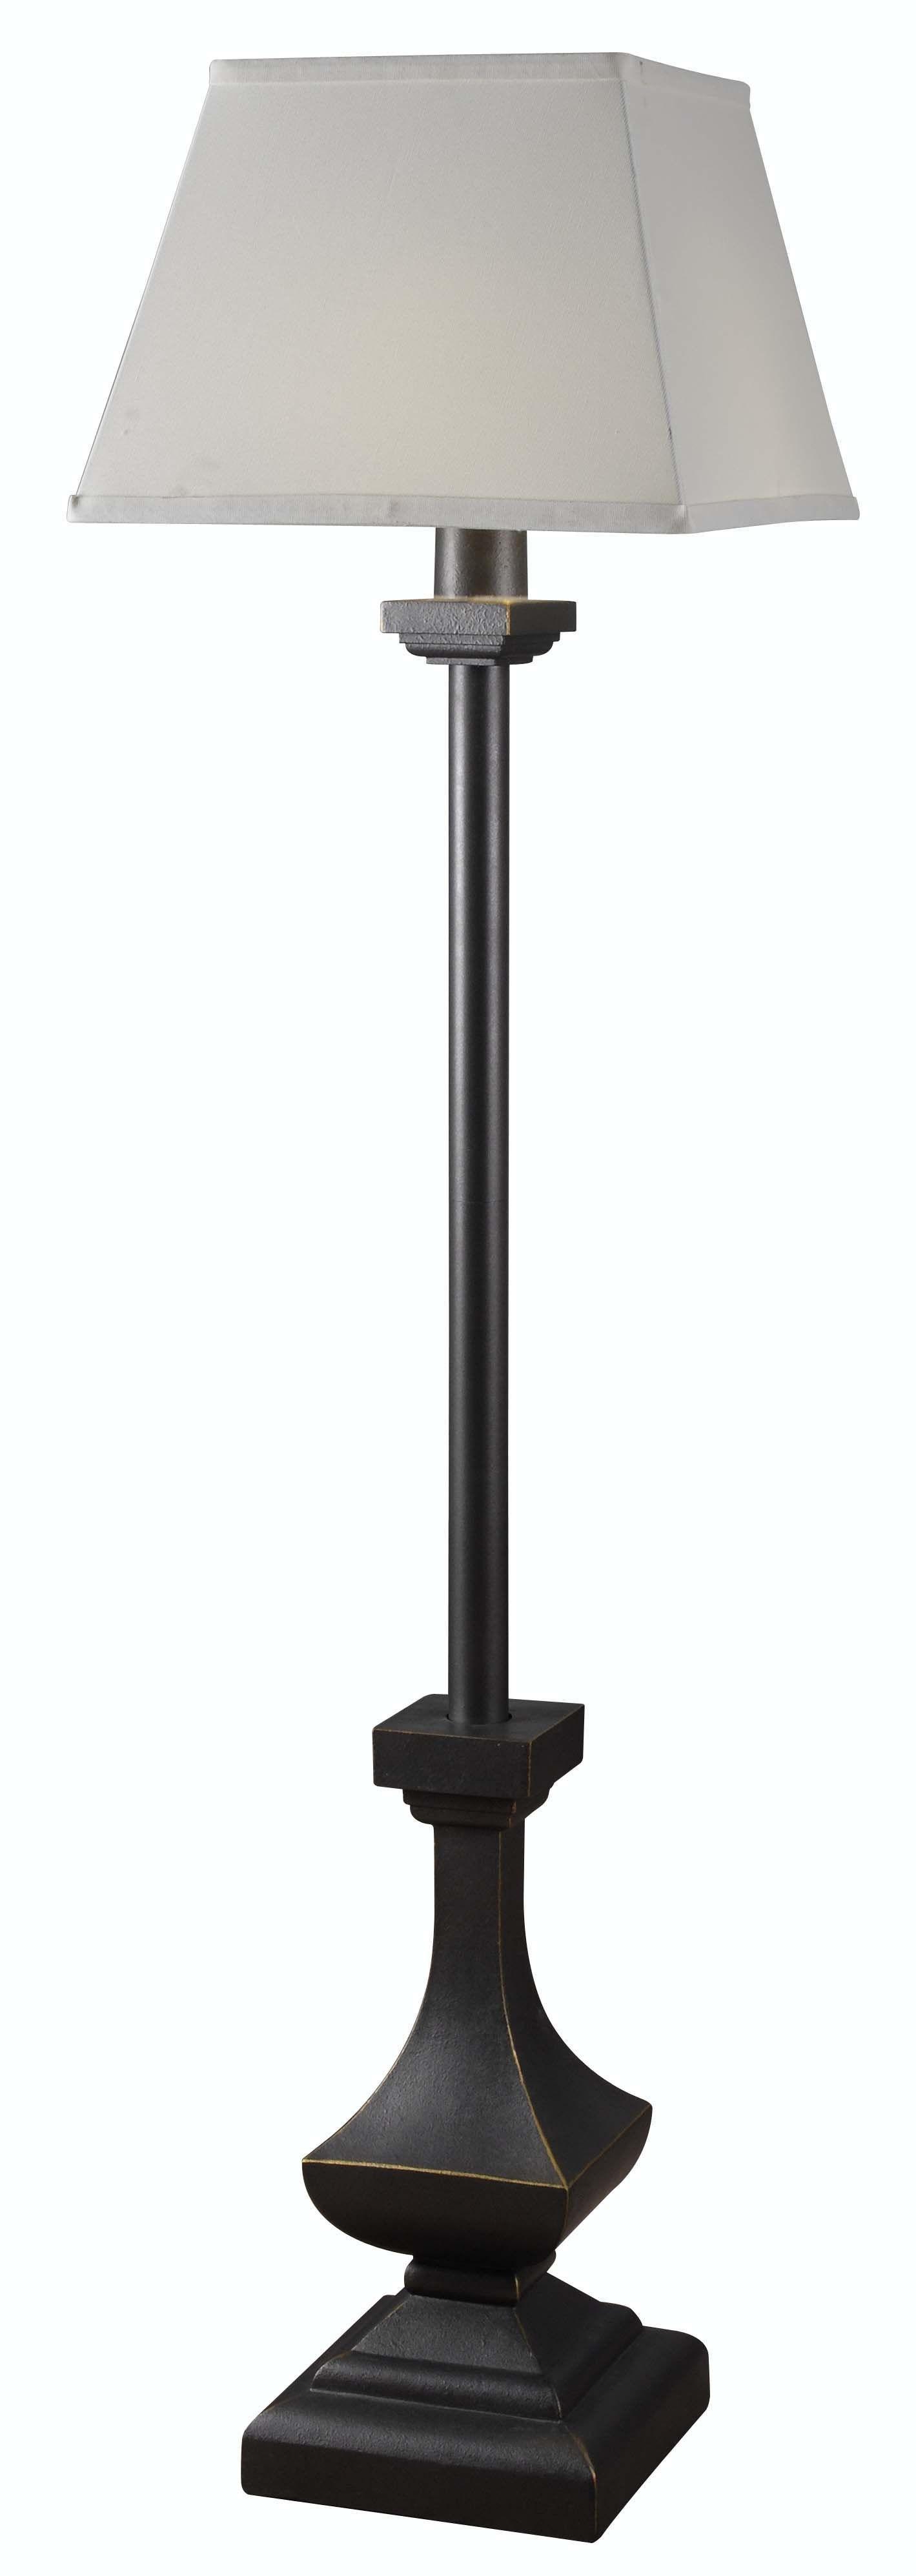 palladium outdoor solar floor lamp from kenroy 32571wbz. Black Bedroom Furniture Sets. Home Design Ideas